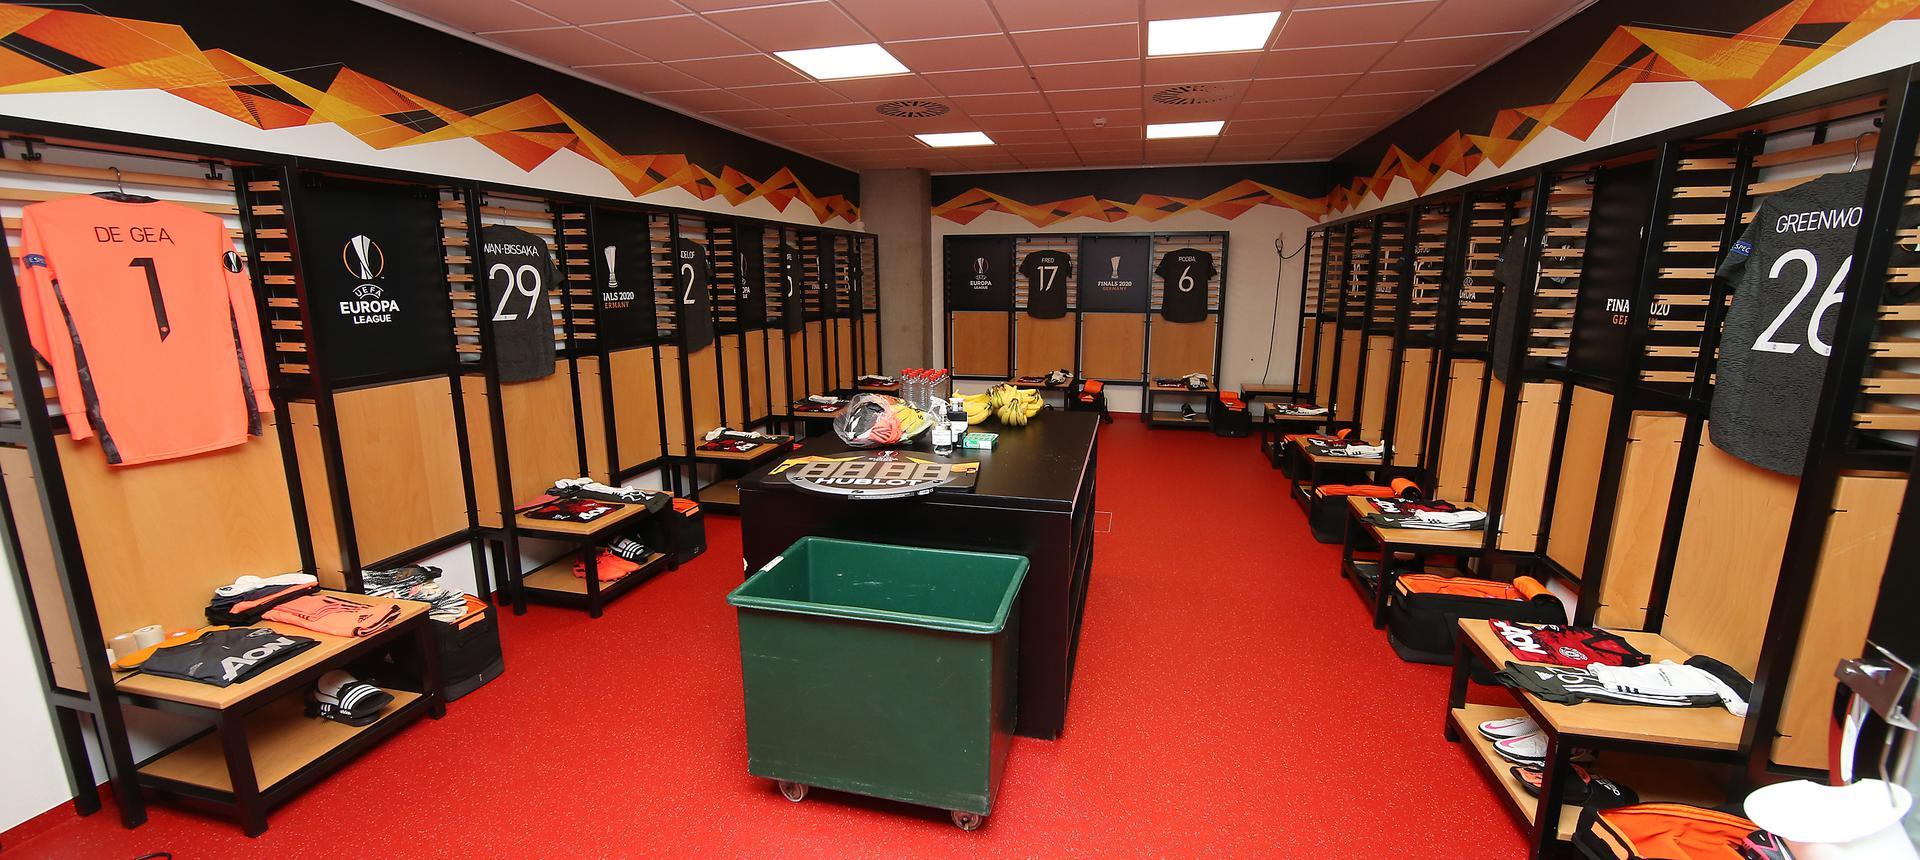 Dressing Room Images Ahead Of Man Utd V Sevilla 16 August 2020 Manchester United